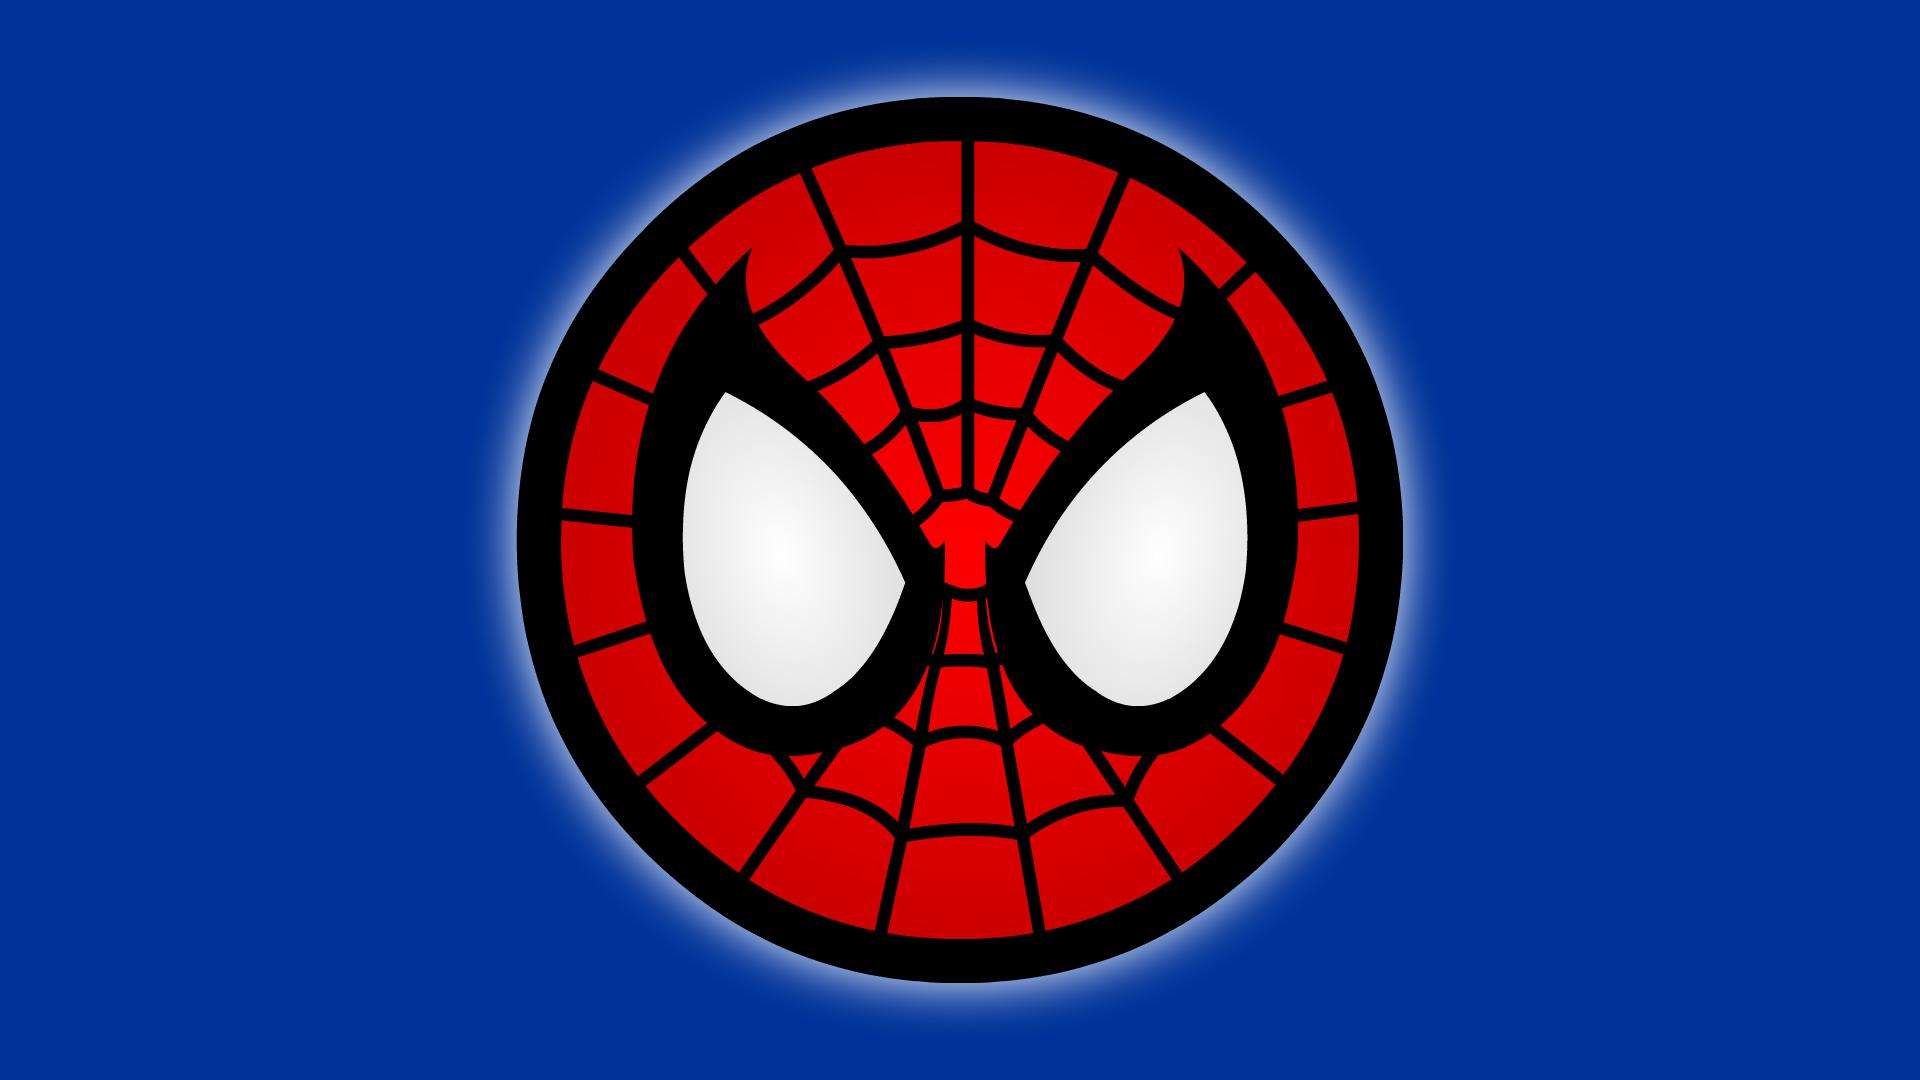 Spider Man Fondo De Pantalla Hd Fondo De Escritorio